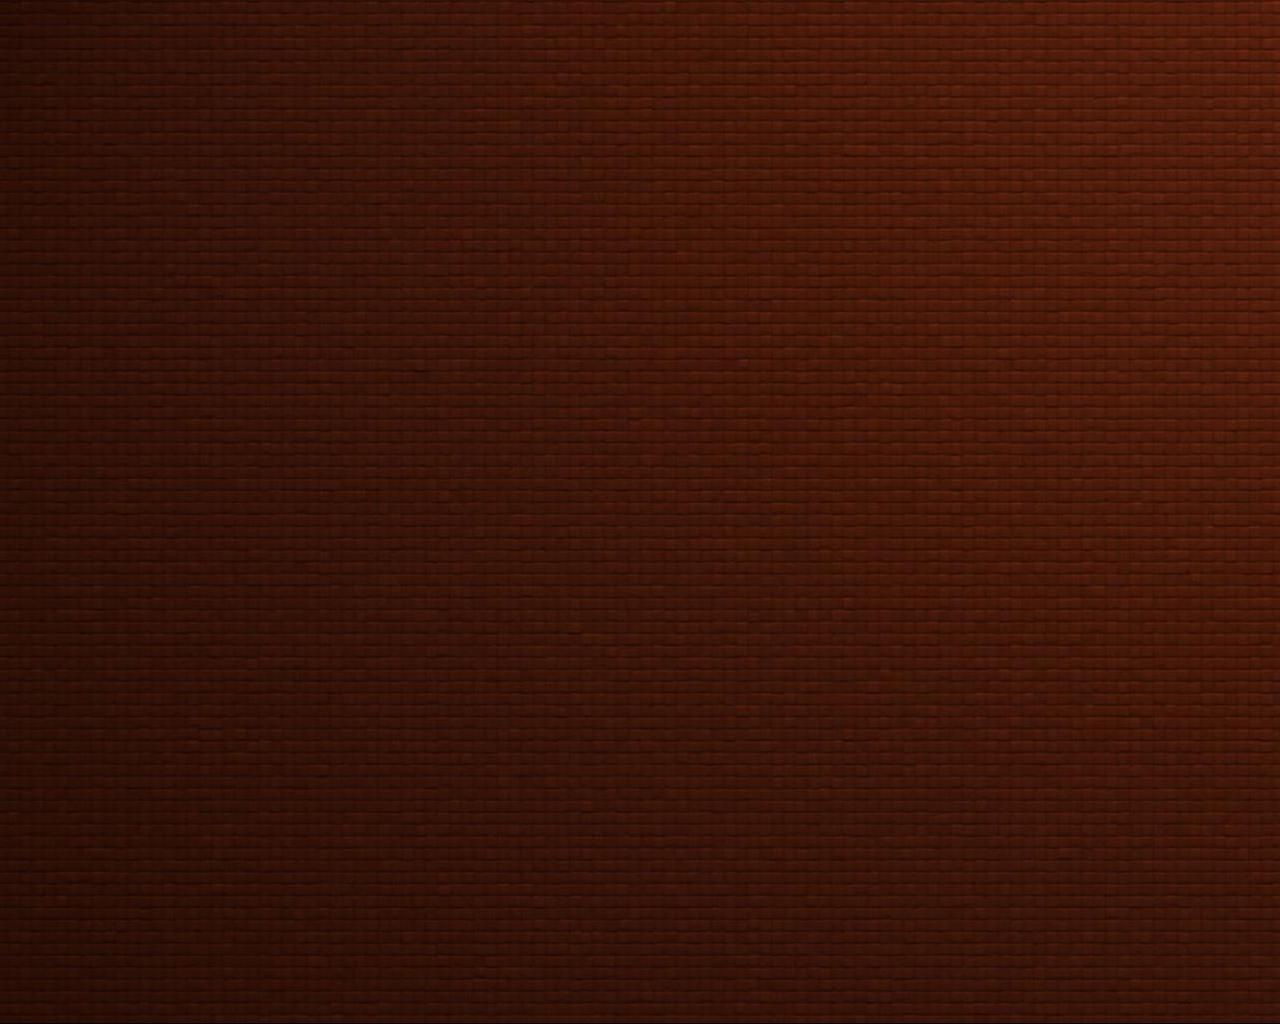 1280x1024 Brown Windows Wallpaper Abstract Brown Wallpaper 1280x1024